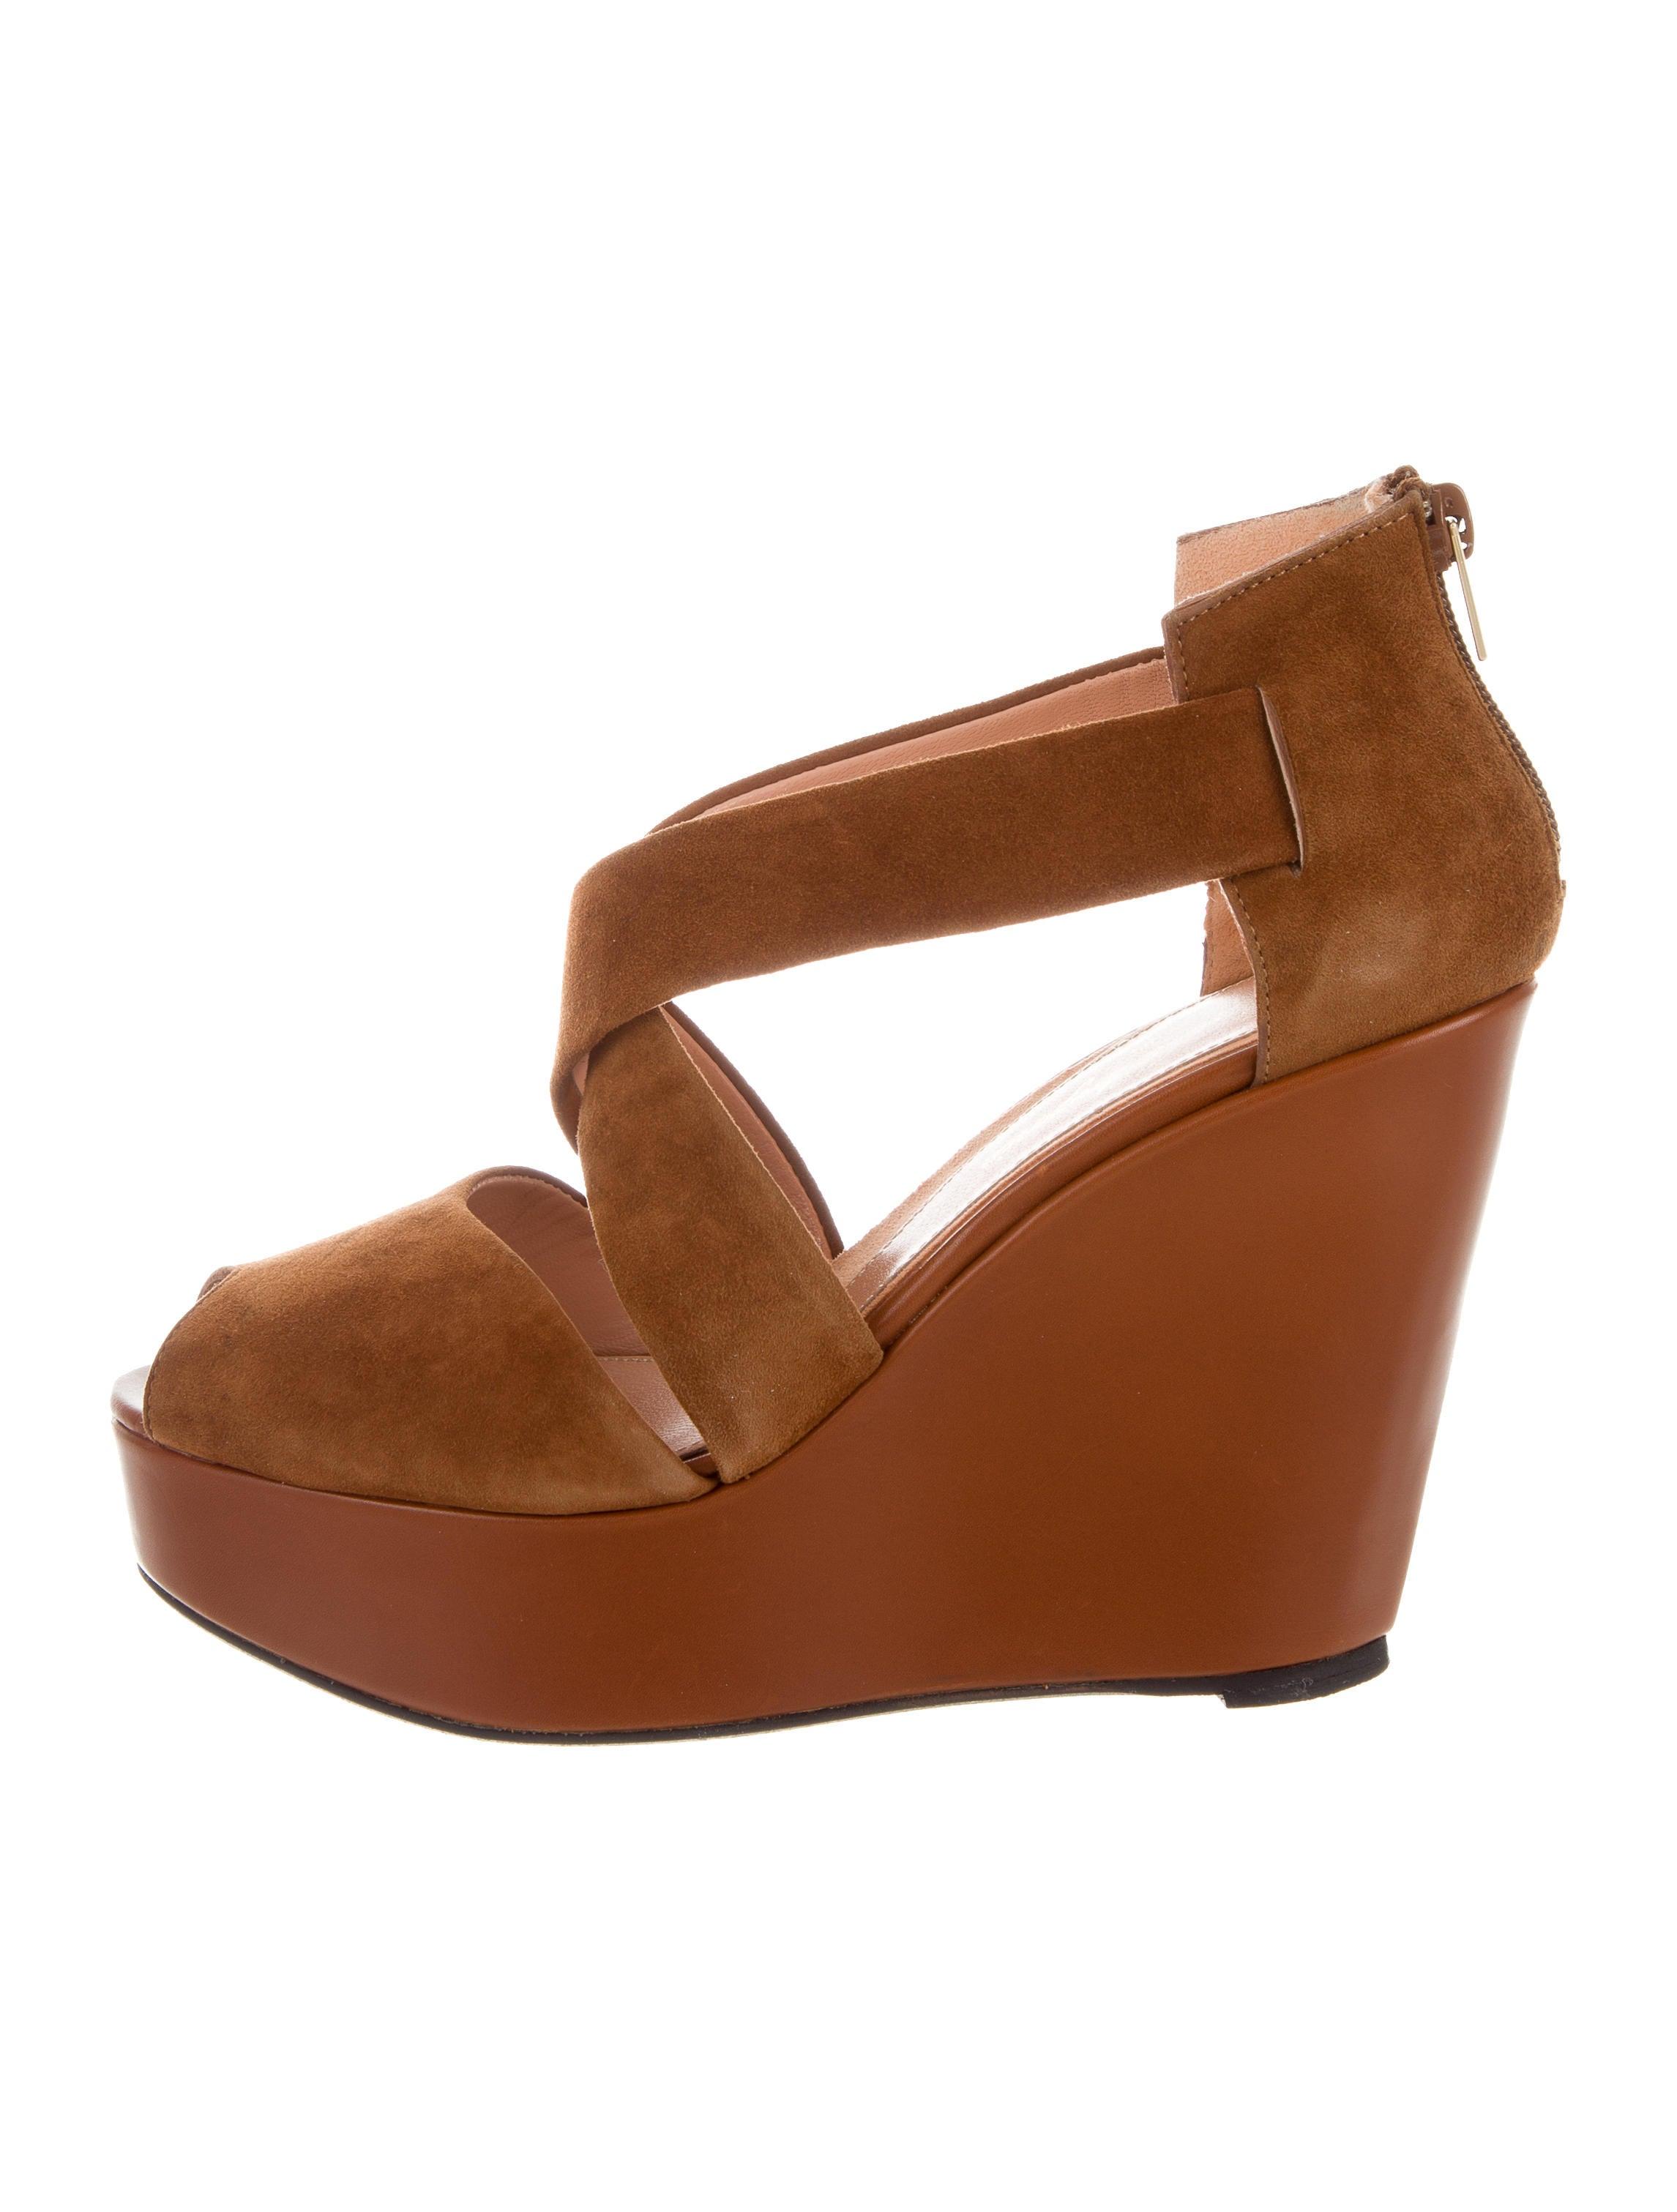 enjoy sale online Robert Clergerie Borset Wedge Sandals cheap sale for nice manchester great sale for sale uOPSXL